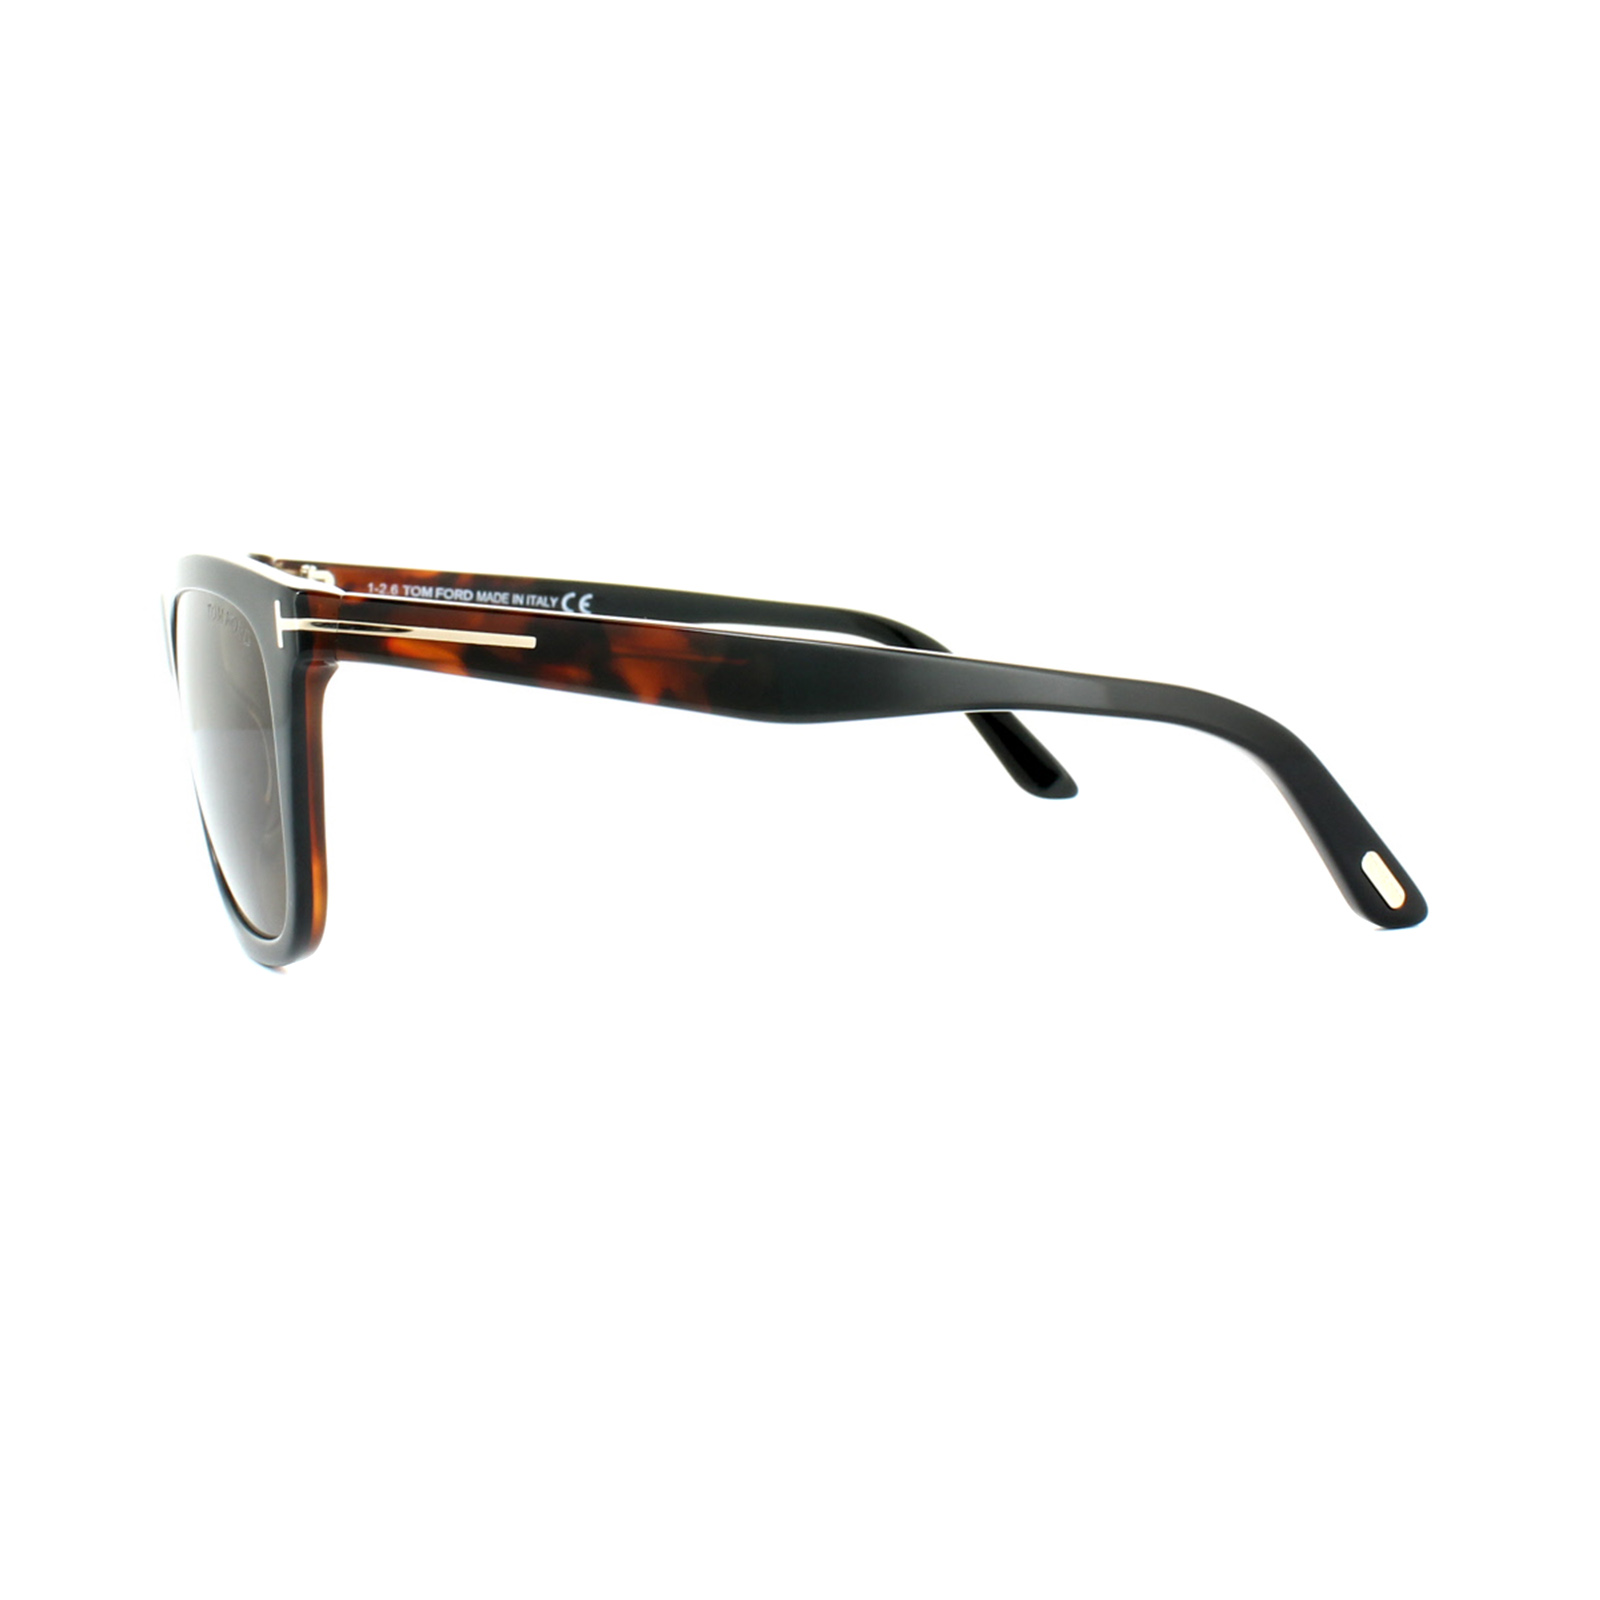 d91c7a2e363 Sentinel Tom Ford Sunglasses 0500 Andrew 05J Black Havana Roviex Brown